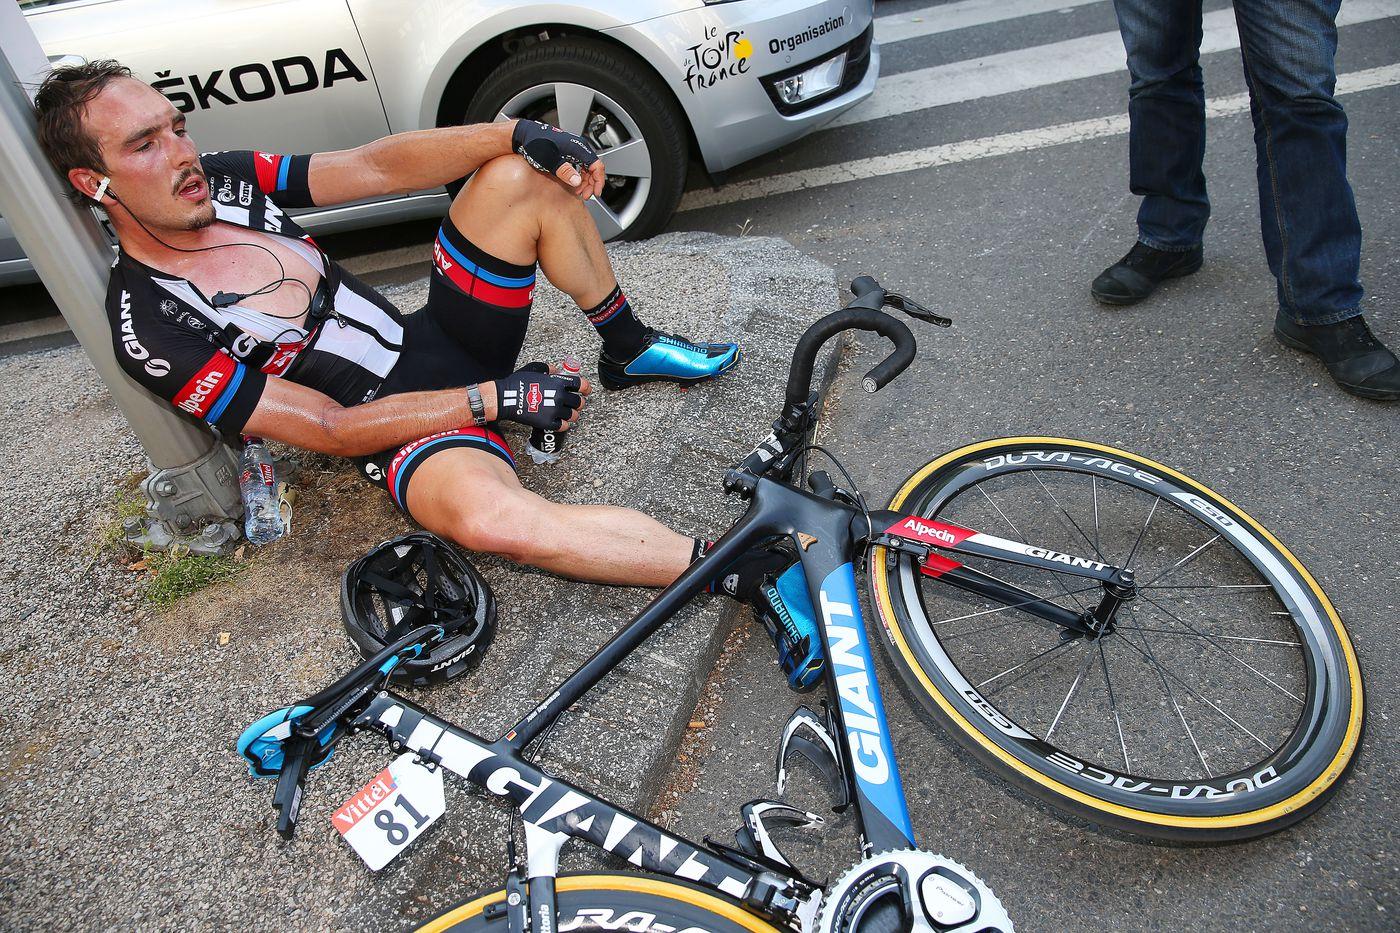 Tour de France riders put their bodies through hell. An expert ...